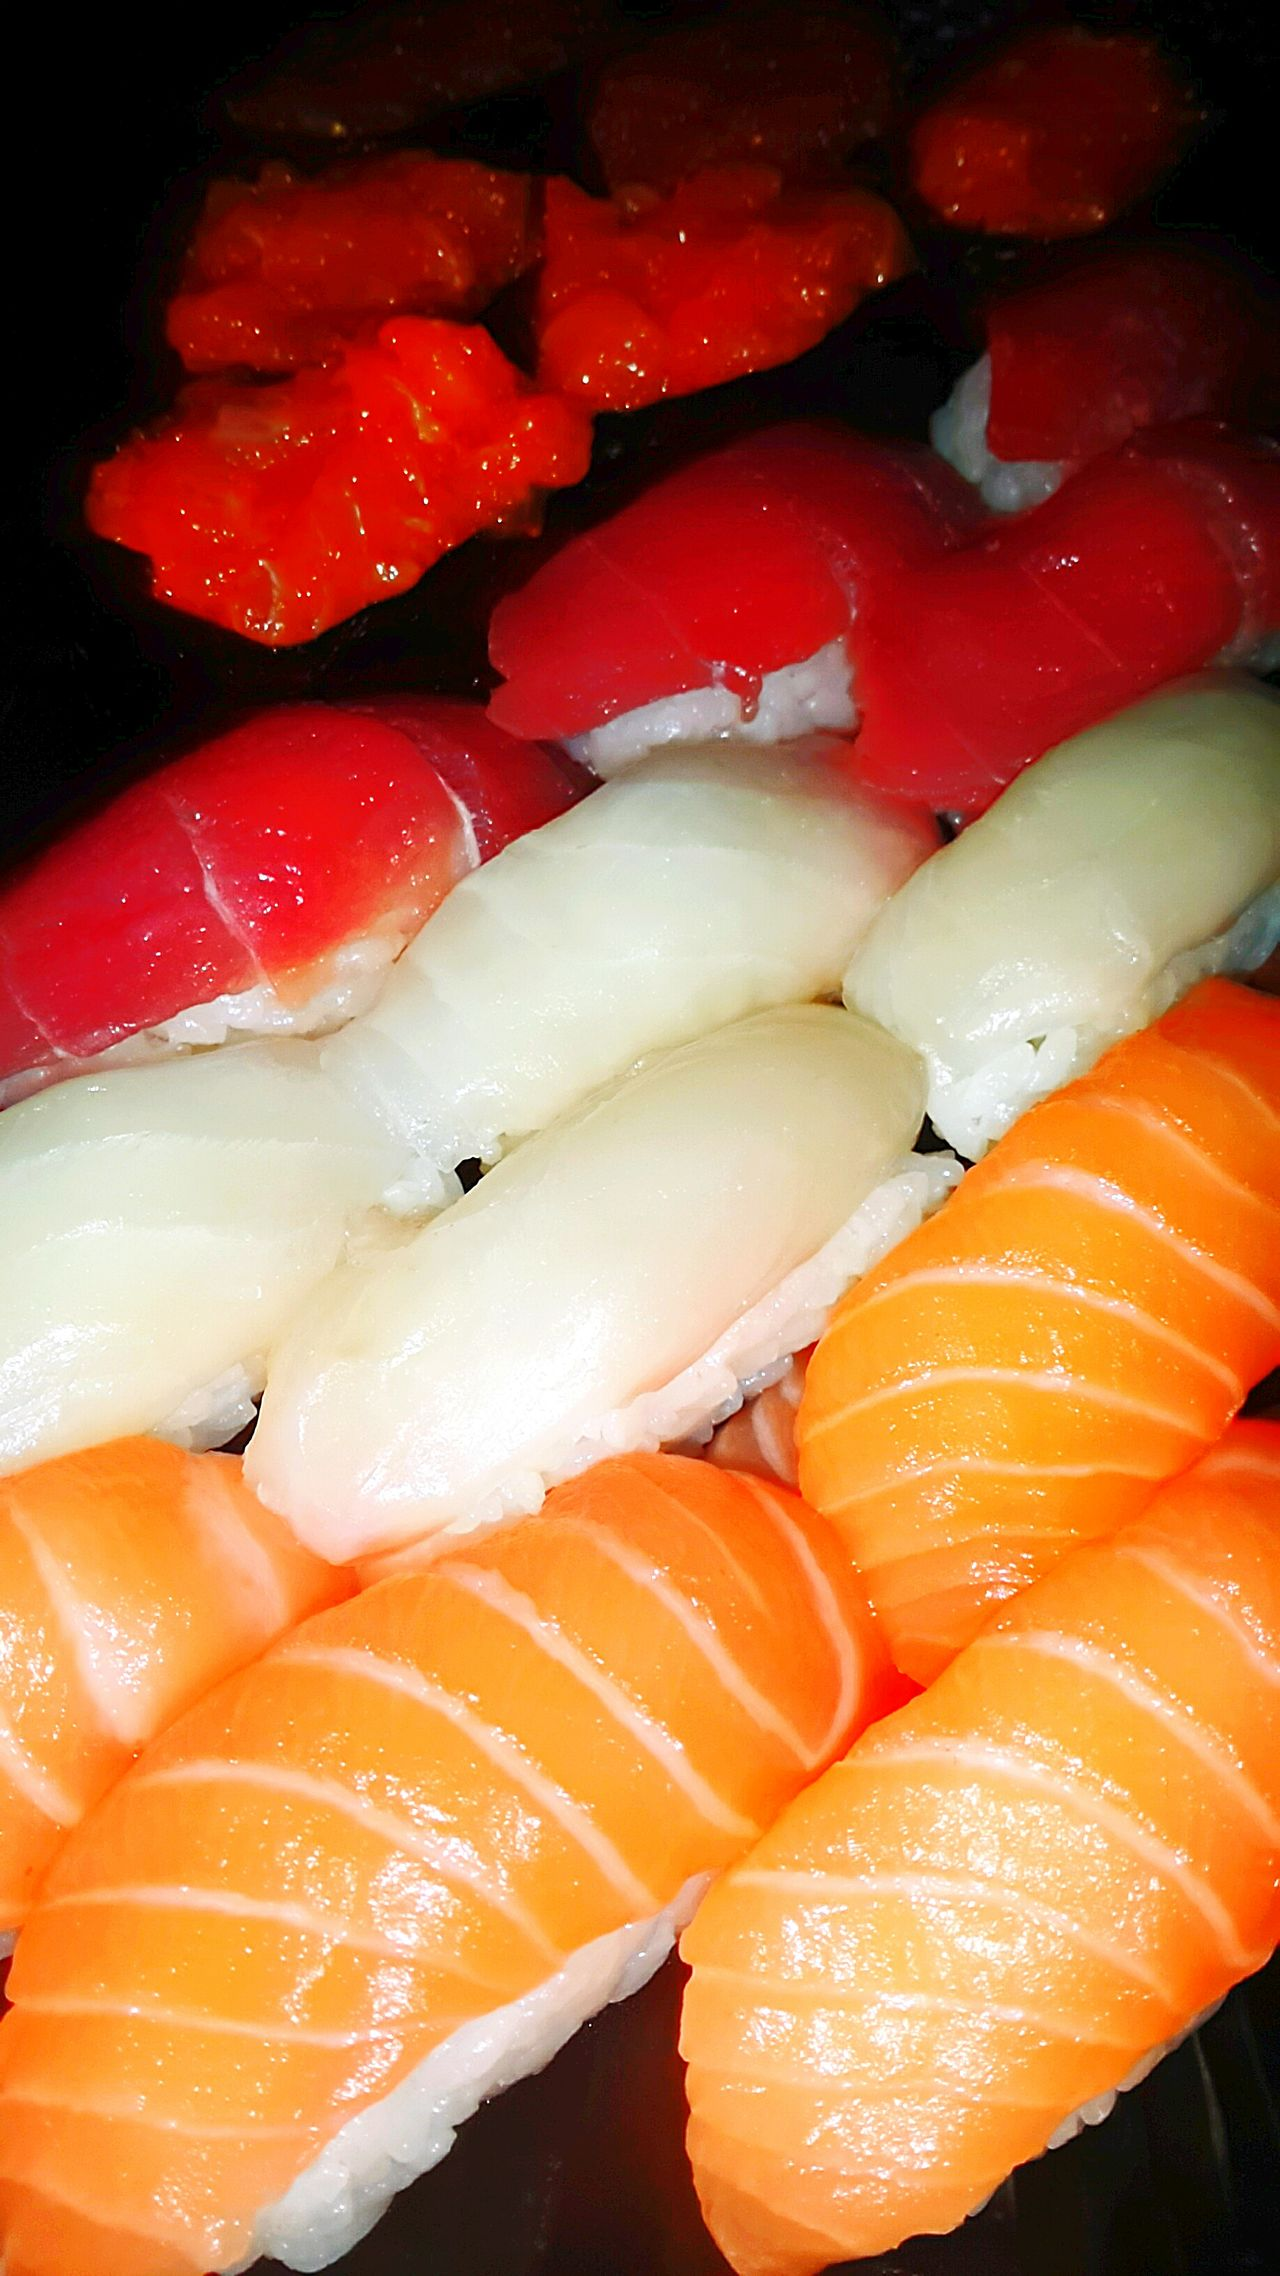 No People Close-up Sushi Restaurant Sashimi Dinner Sushitime Sushi Rolls Sushilover Sushi Time SushiBar Sashimi Dish Sushi Love Sushitei Sushilove Sashimilovers Sashimi Bowl Sashimi Top Sashimi Platter Sashimi Lunch Sashimi Special Japanesefood Multi Colored Gourmet Ready-to-eat Freshness Food And Drink